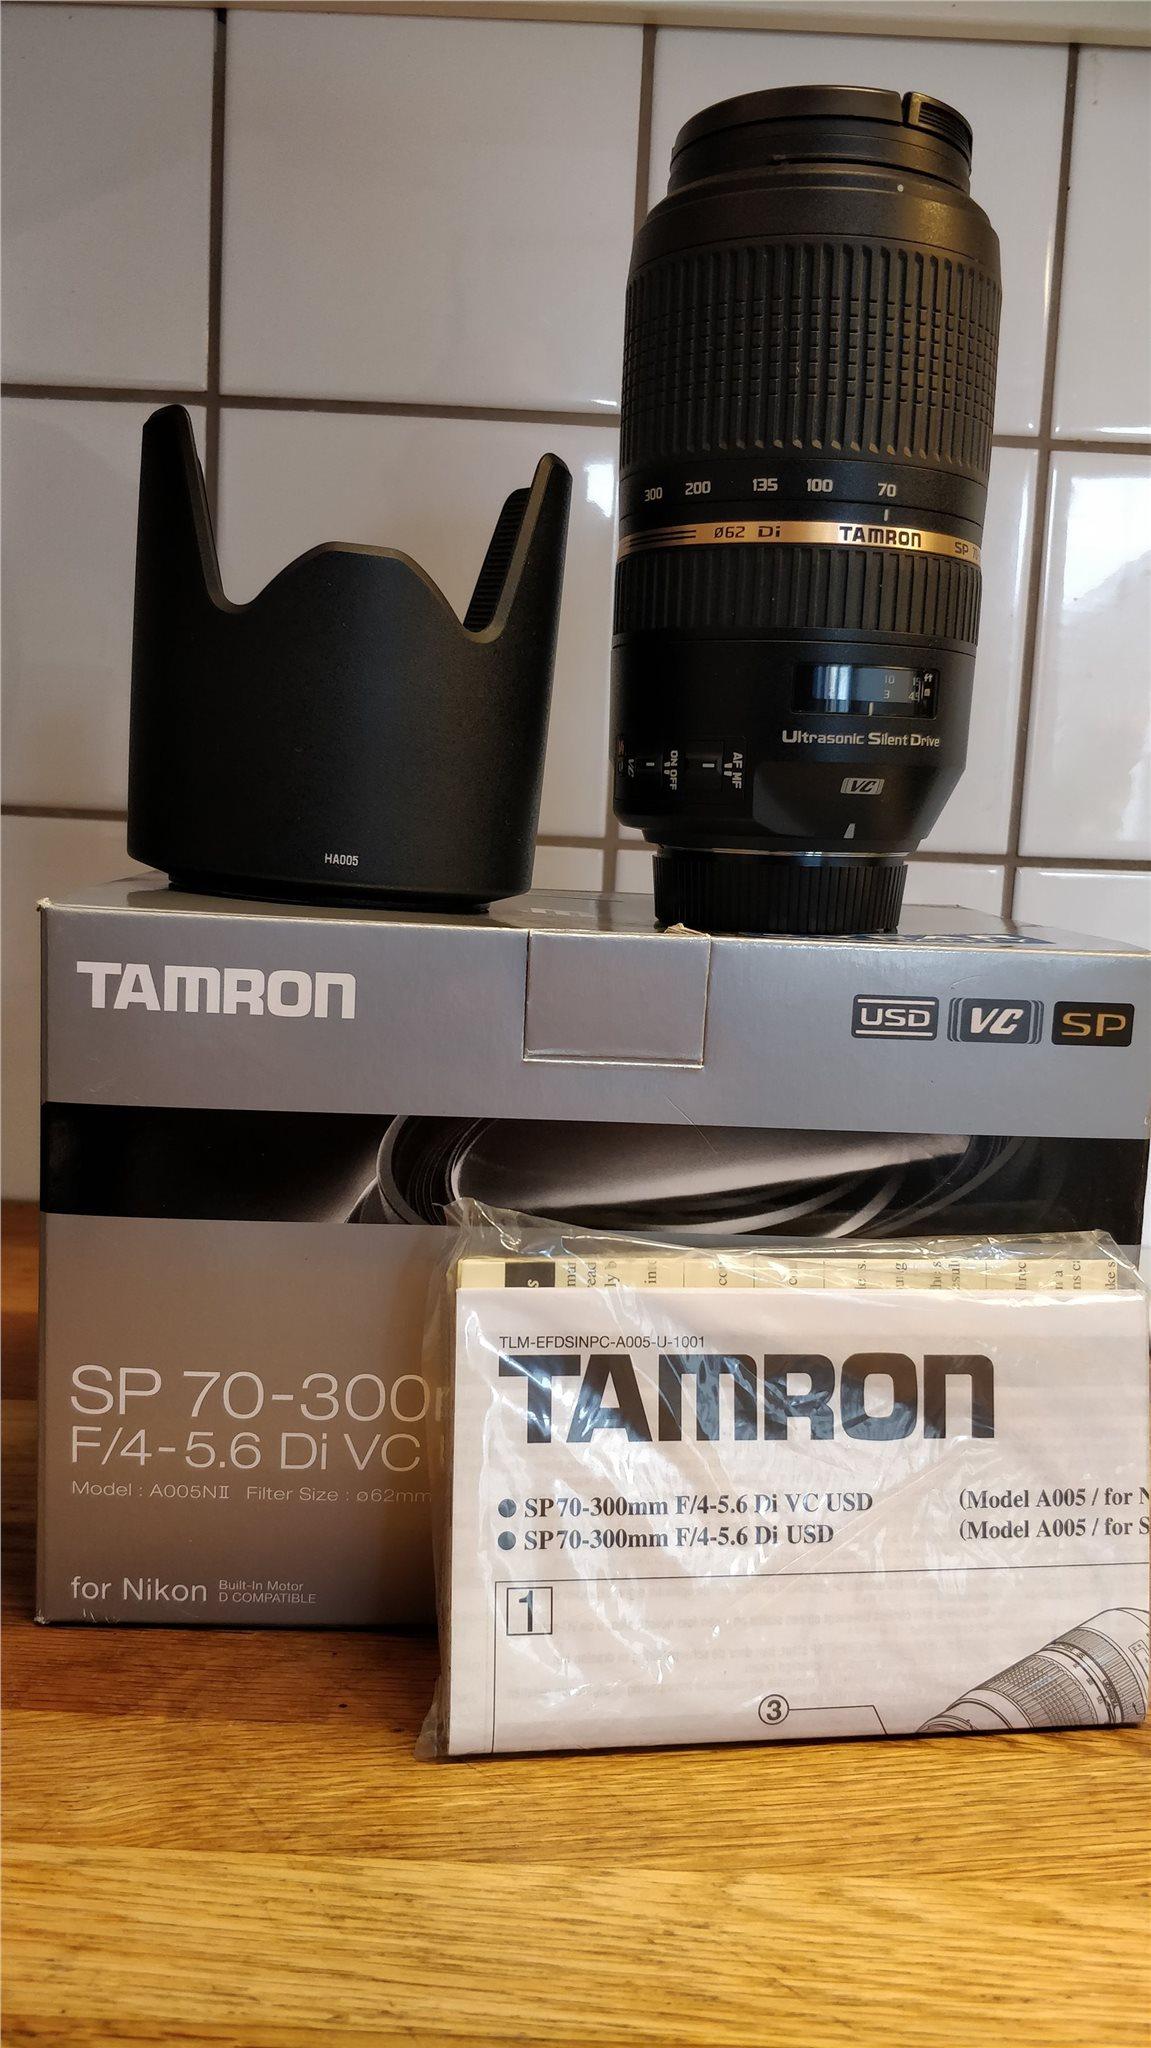 Tamron Sp 70 300mm F 4 56 Di Vc Usd 324226104 Kp P Tradera For Nikon F4 Lens